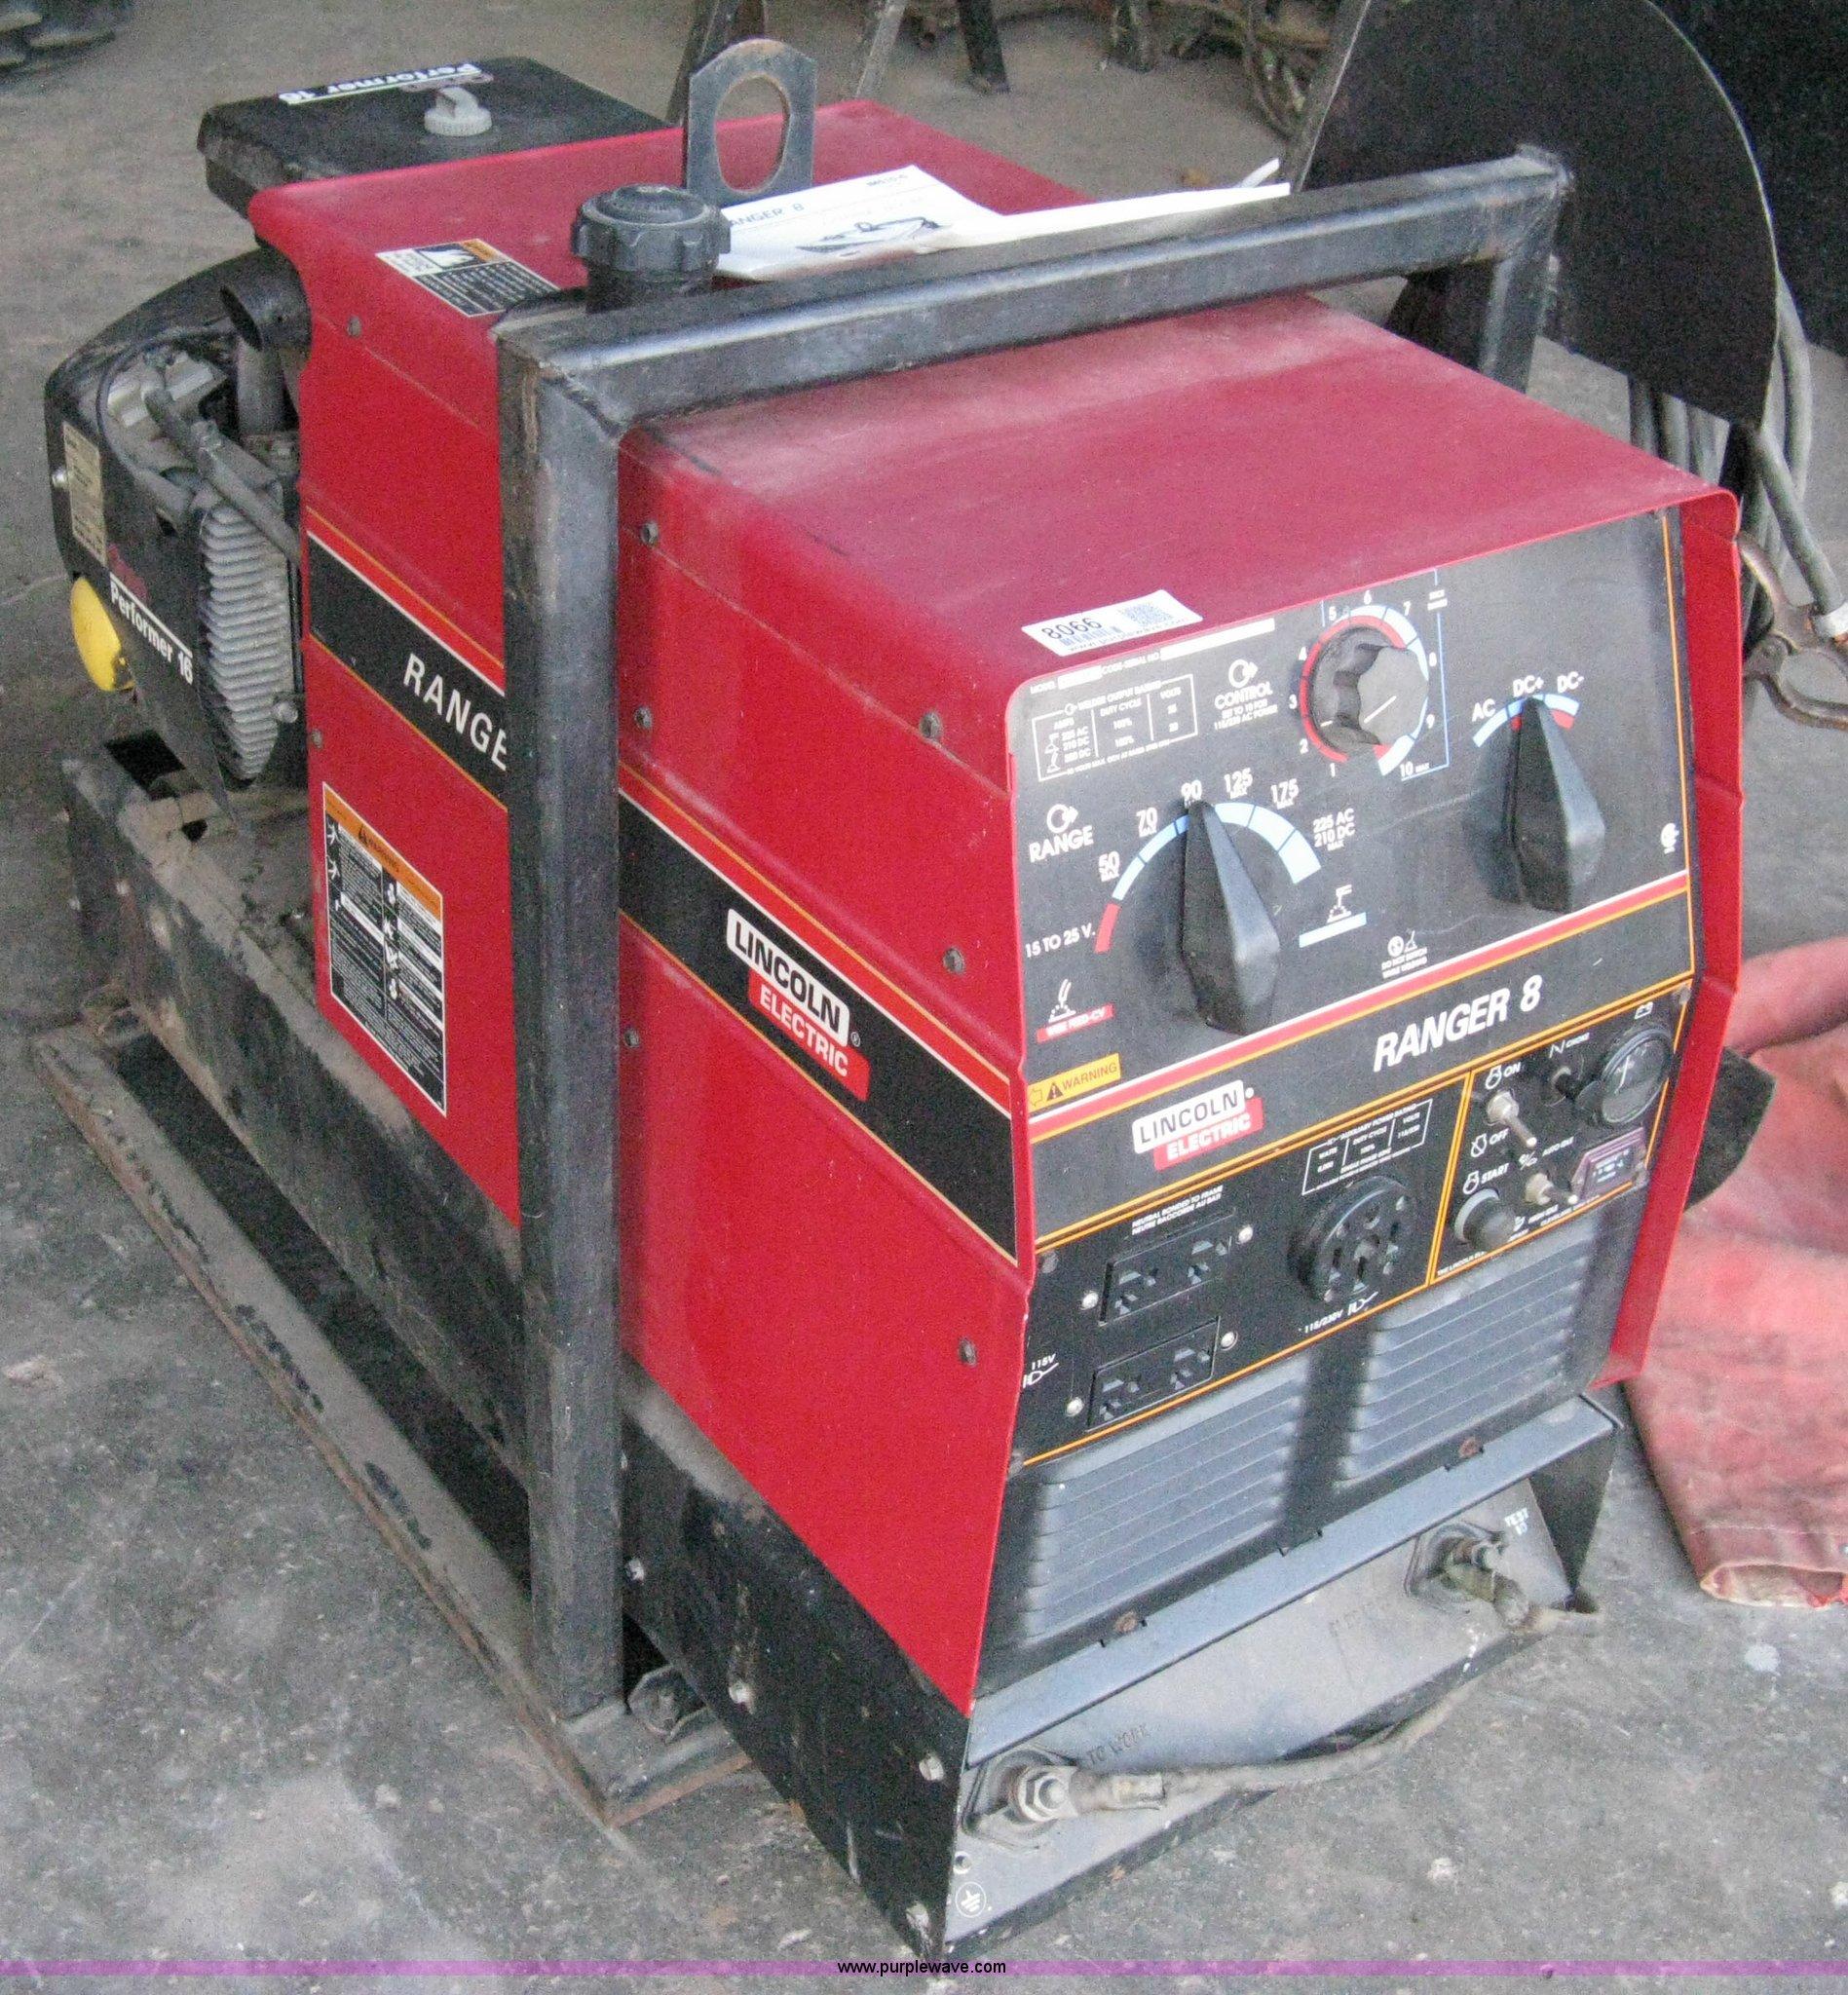 Lincoln Ranger 8 welder with Onan Performer 16 gas engine |